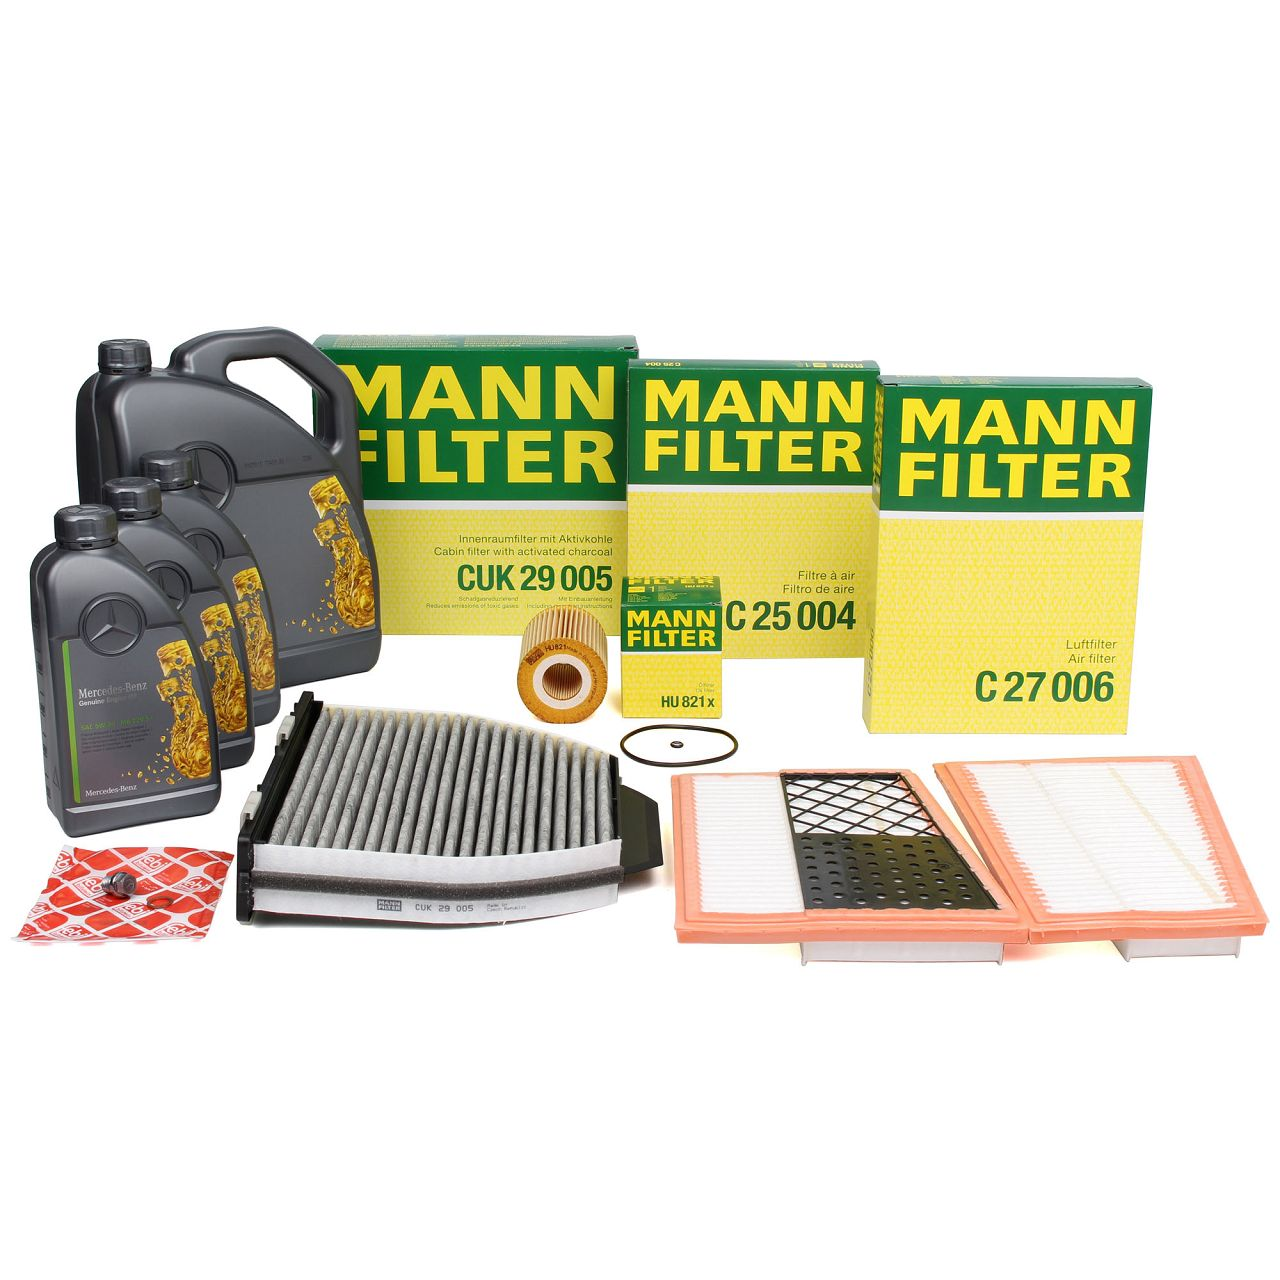 MANN Filterset + 8 L ORIGINAL Mercedes 5W30 Motoröl C-Klasse W204 S204 C320/350CDI